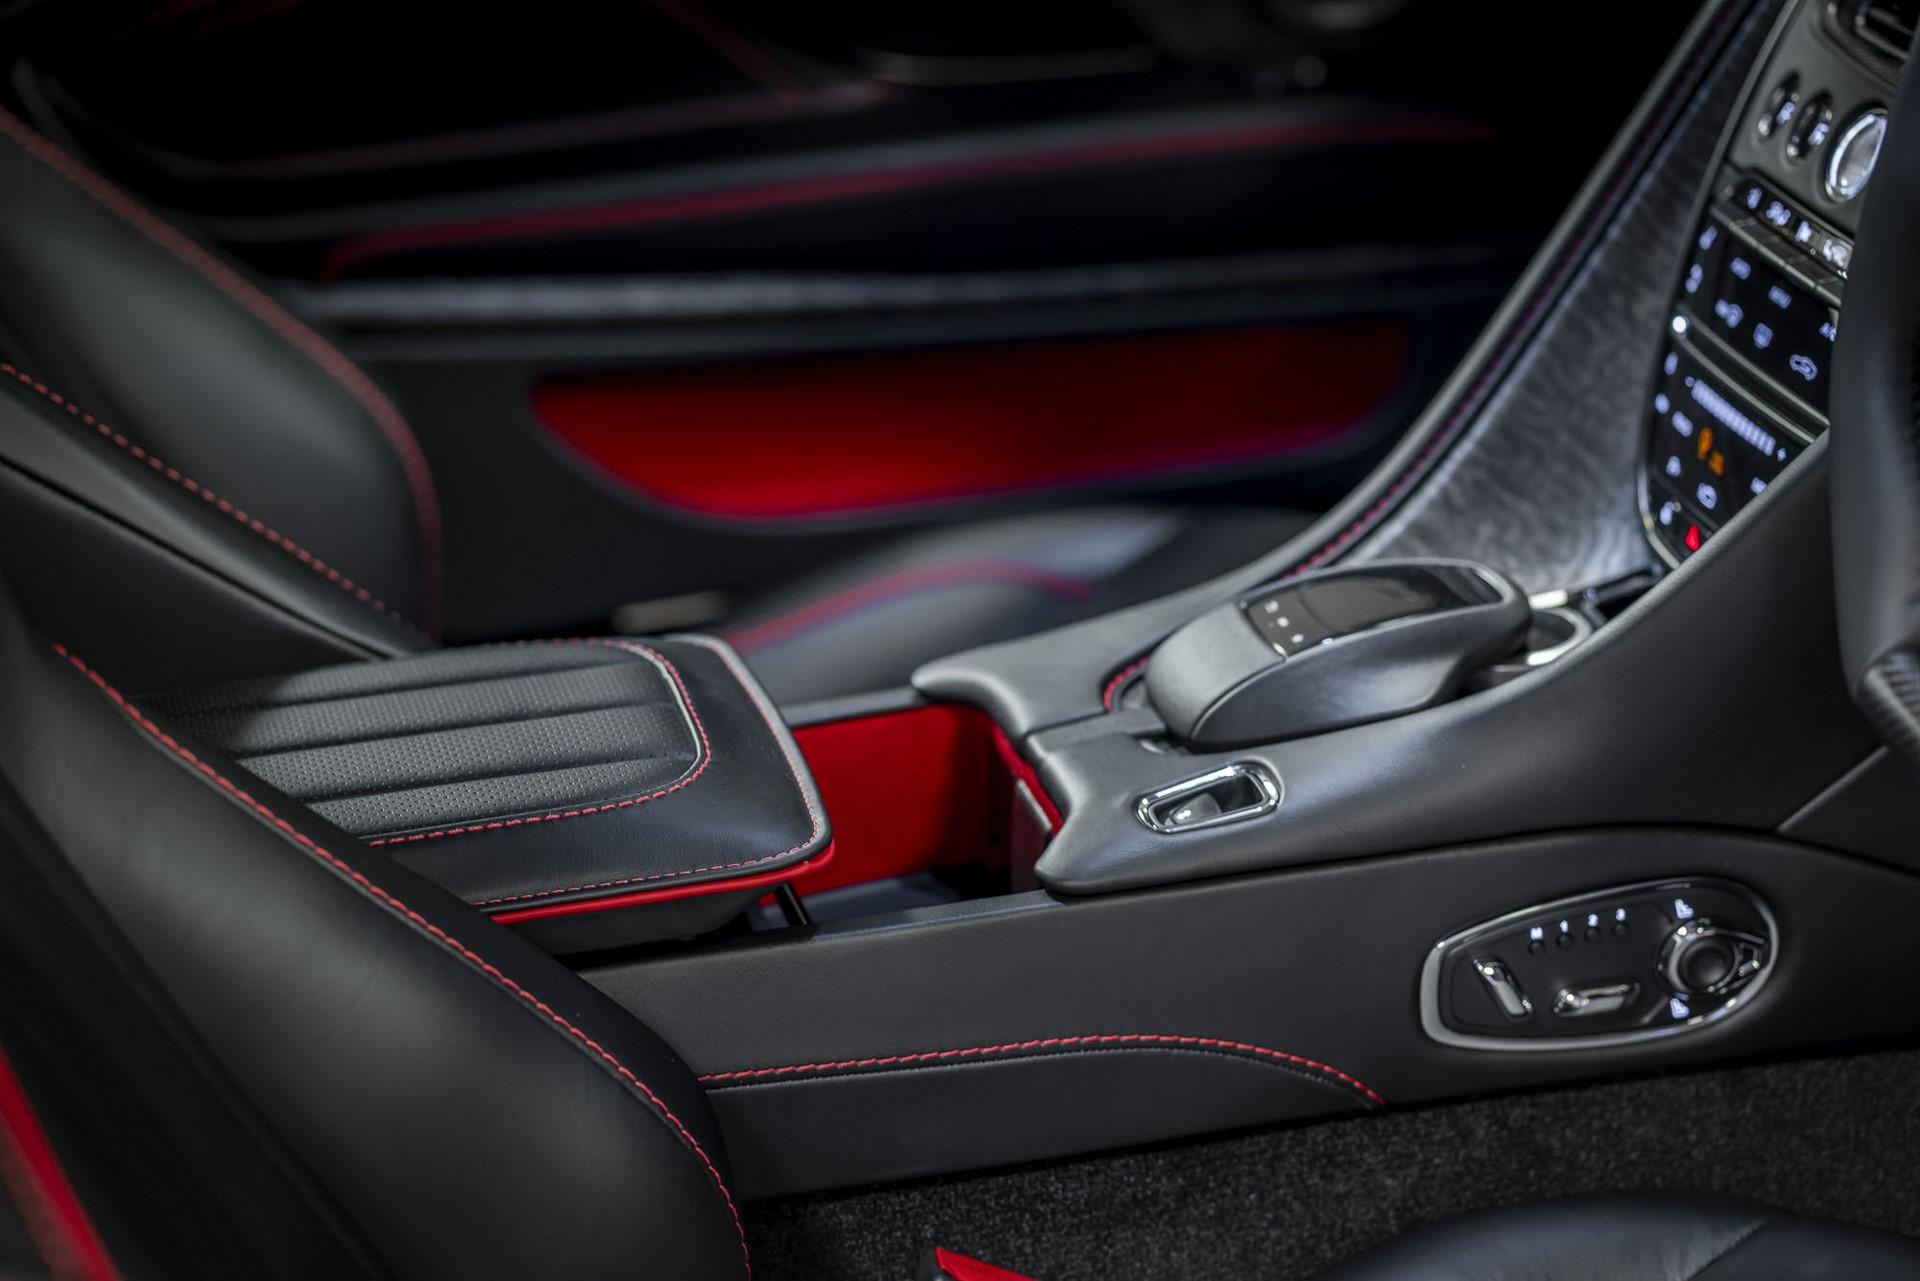 Aston-Martin-DBS-Superleggera-James-Bond-Special-Edition-16